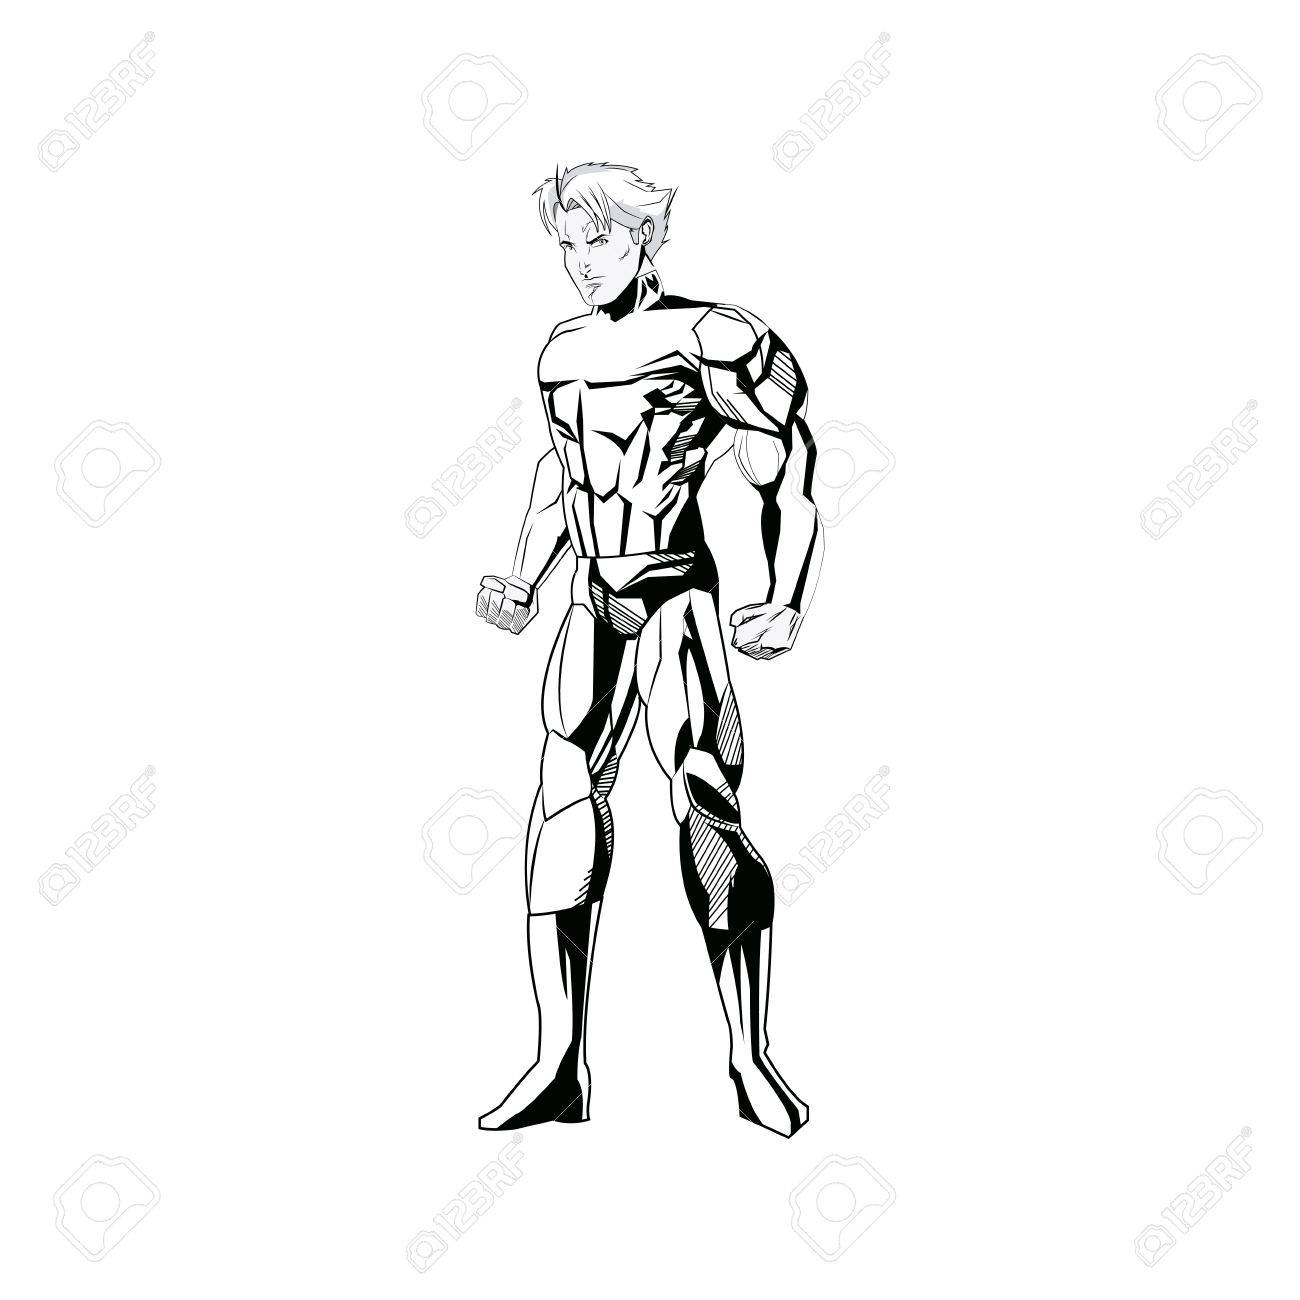 1300x1300 Superhero Figure Standing Proud Image Vector Illustration Royalty